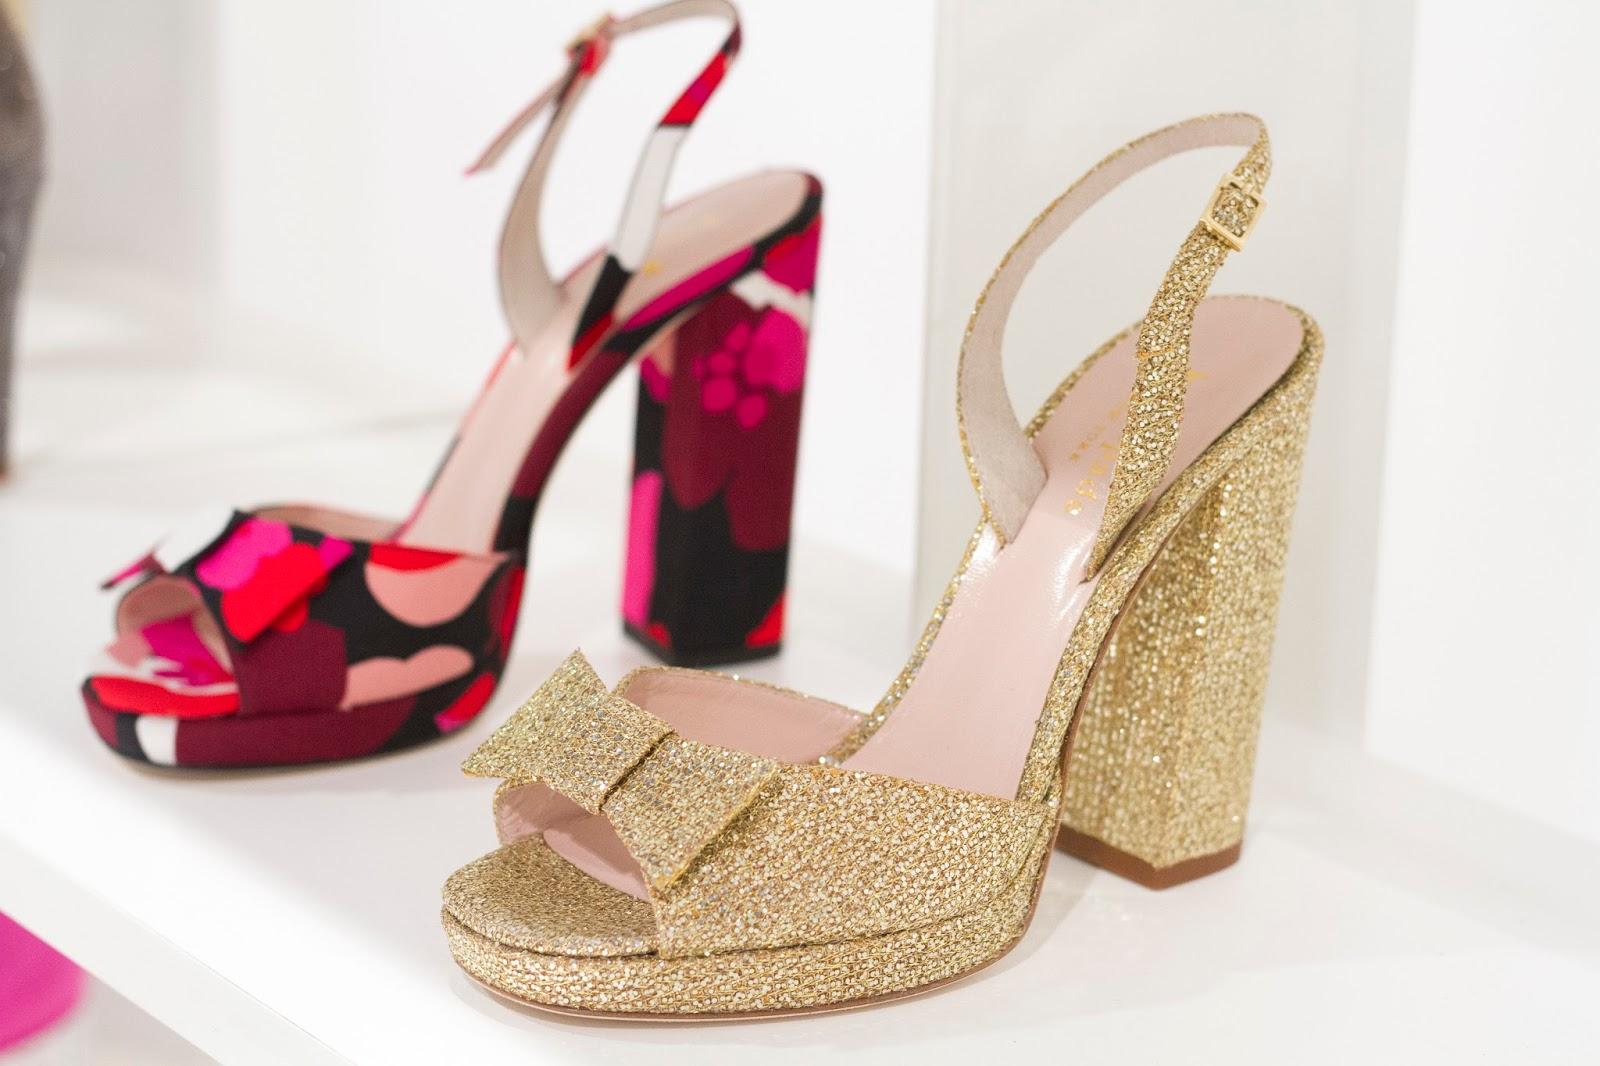 kate spade new york fall 2015 shoe collection fn platform glitter heels